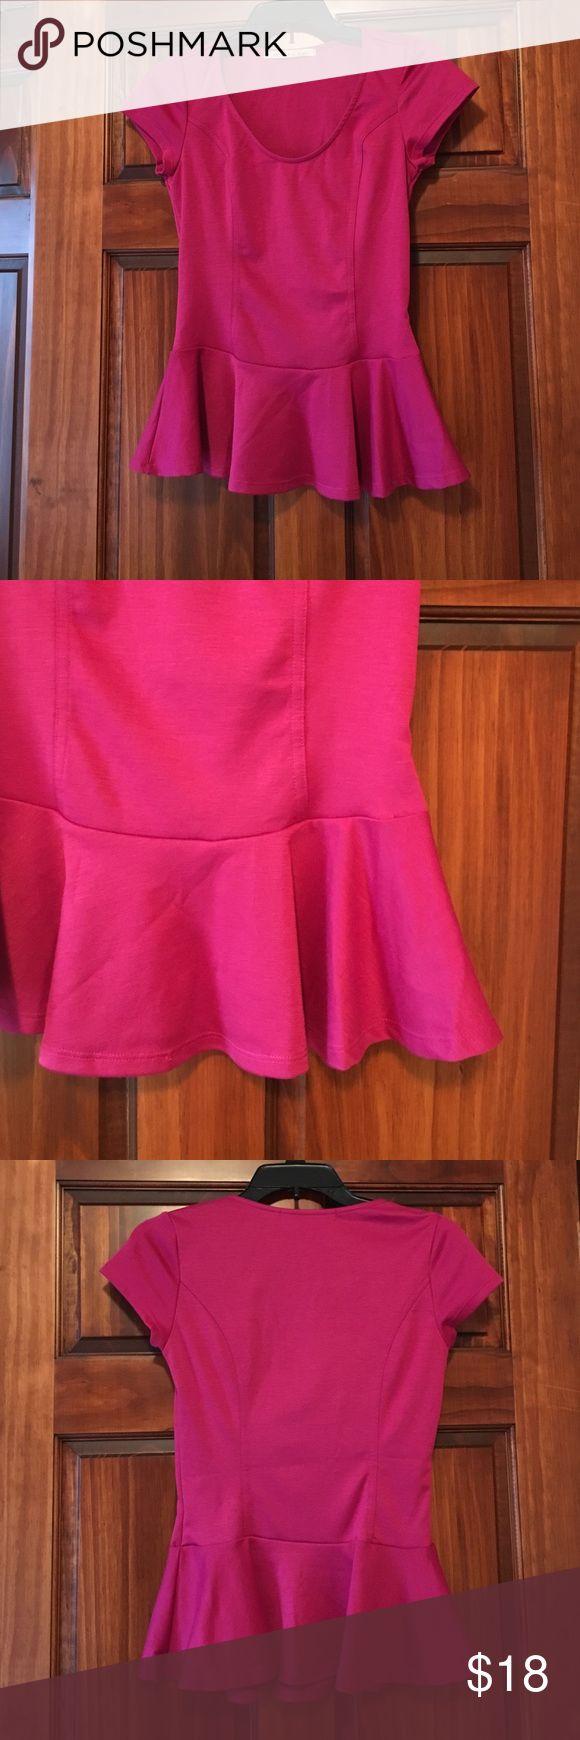 Dark pink peplum top. Size small. Dark pink peplum top. Size small. Never worn :) Tops